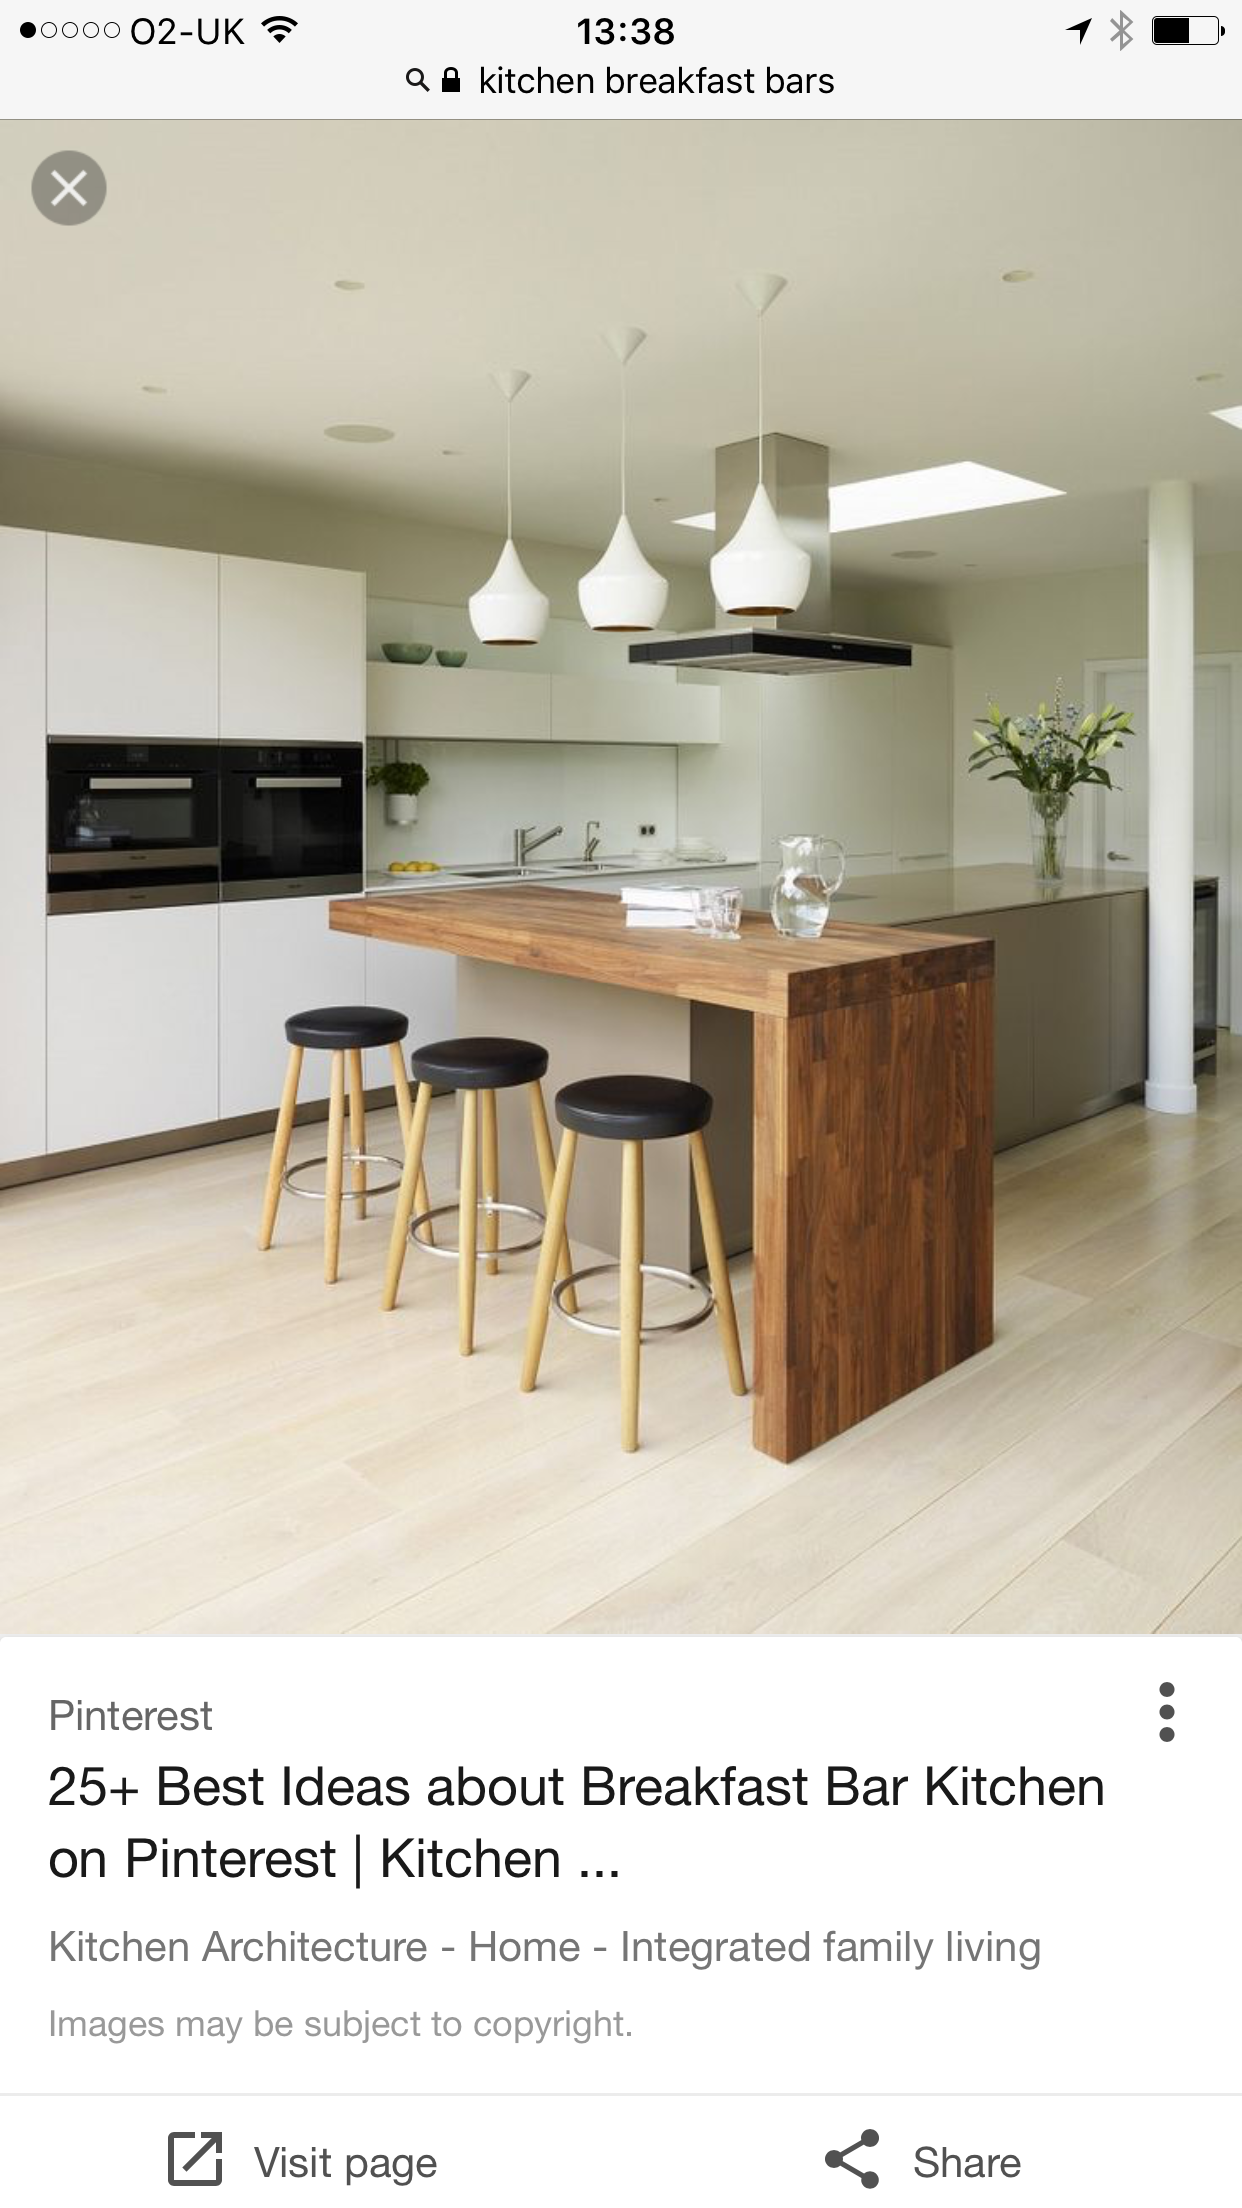 Pin By Negin Hakimian On Kitchen Kitchen Remodel Small Kitchen Design Small Modern Kitchen